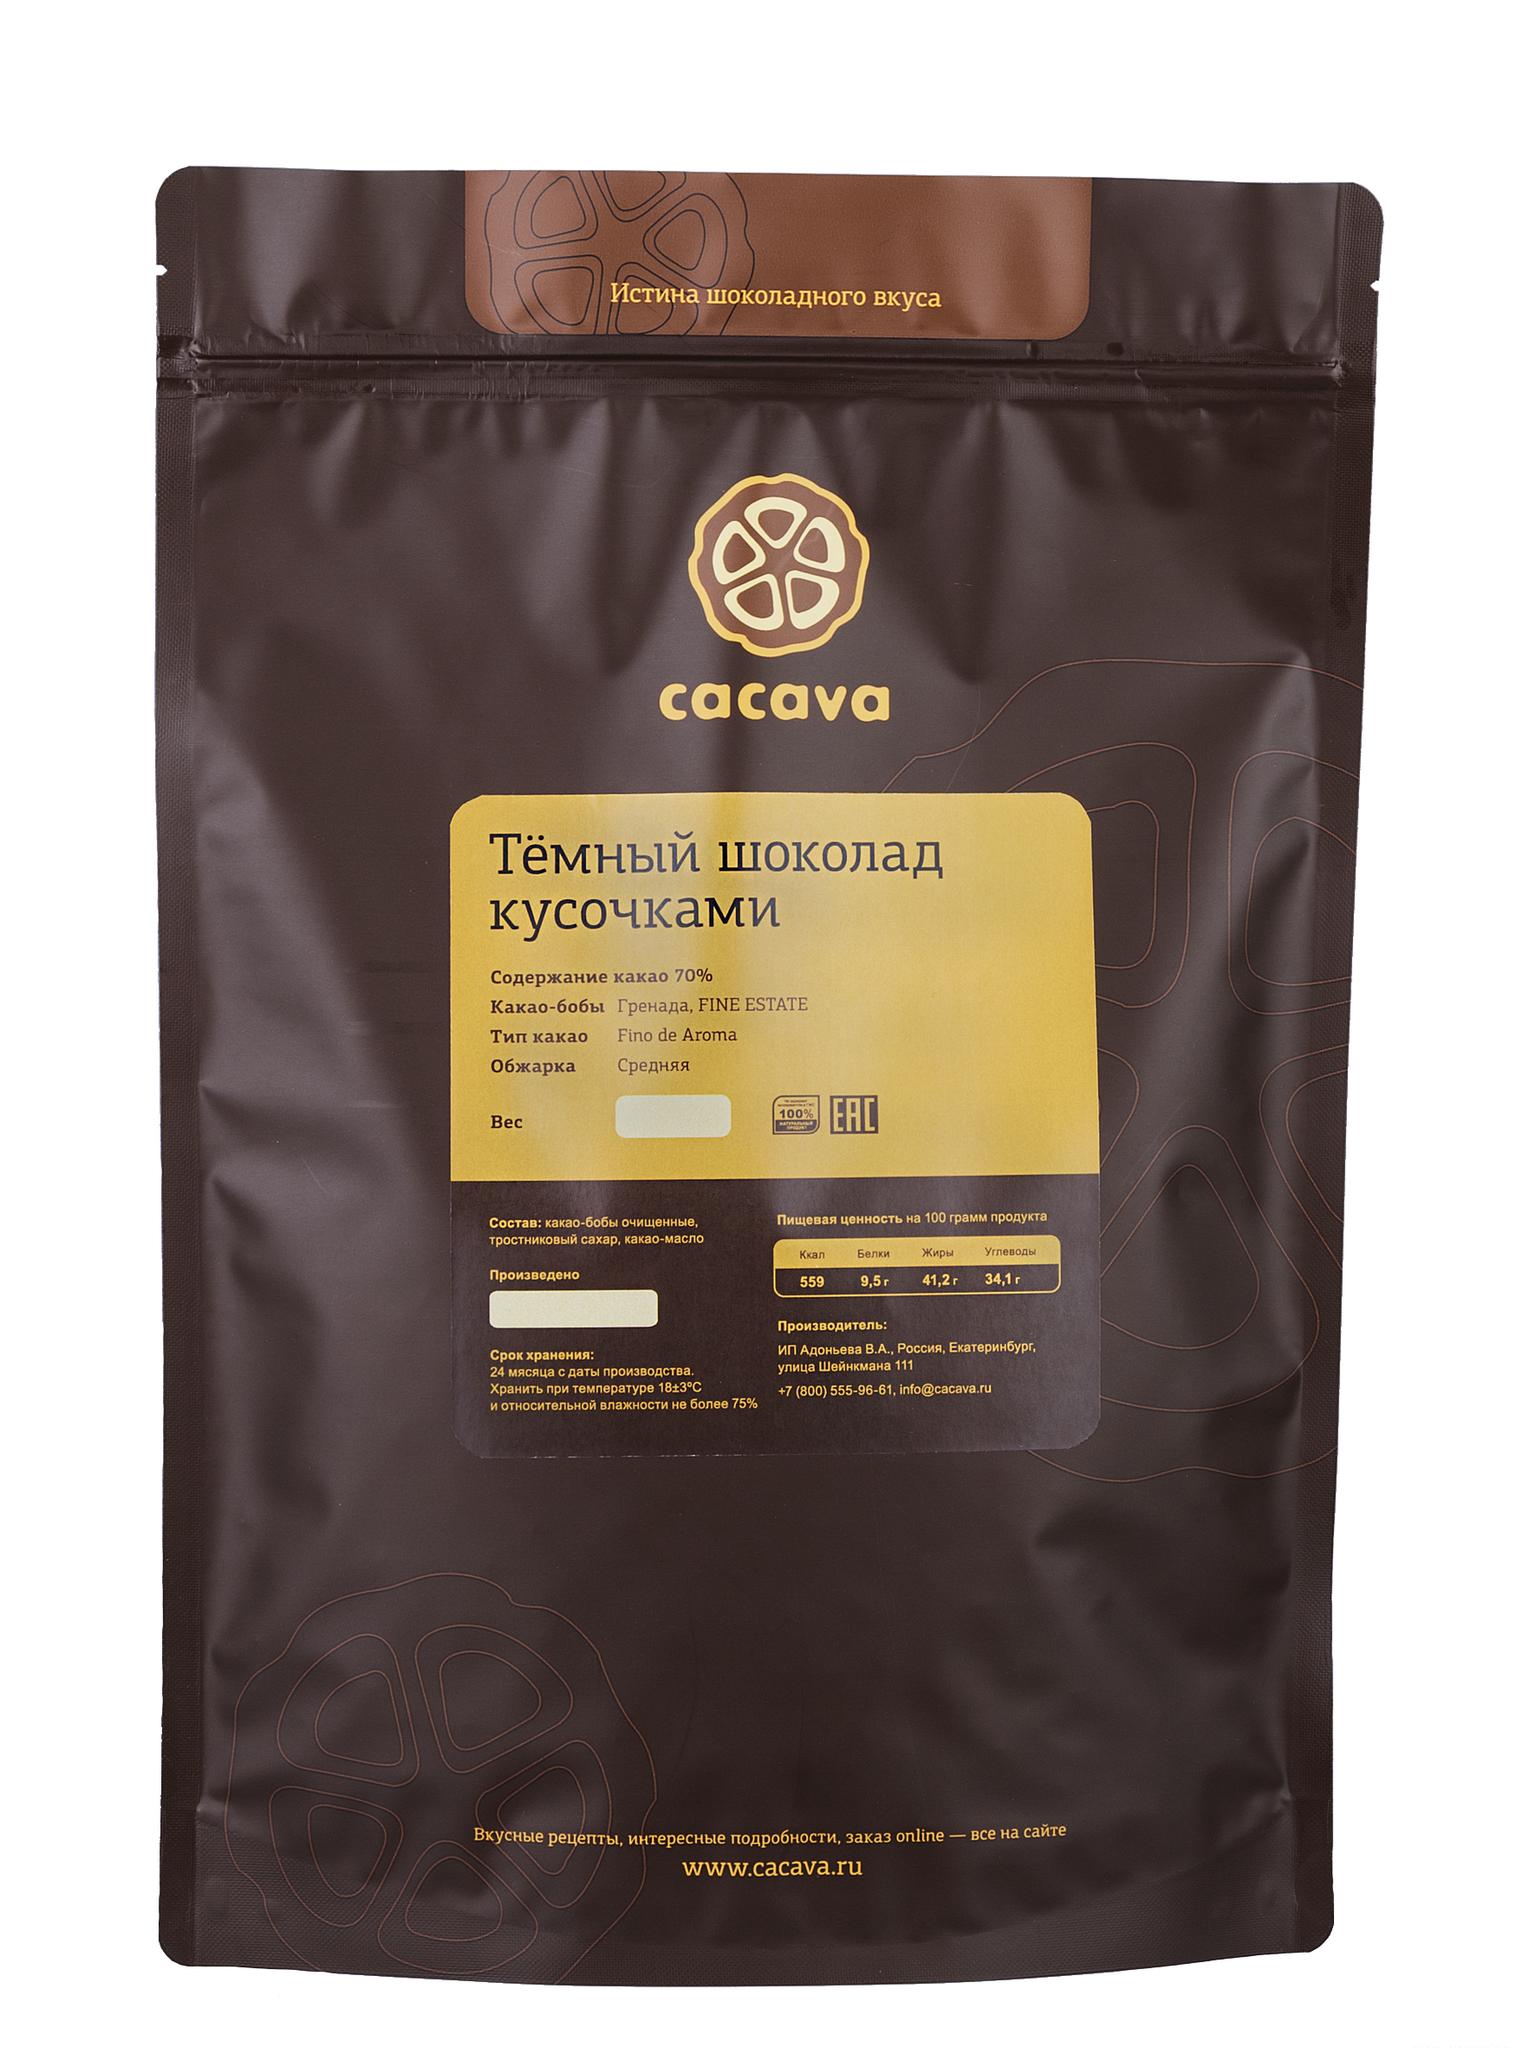 Тёмный шоколад 70 % какао (Гренада), упаковка 1 и 3 кг